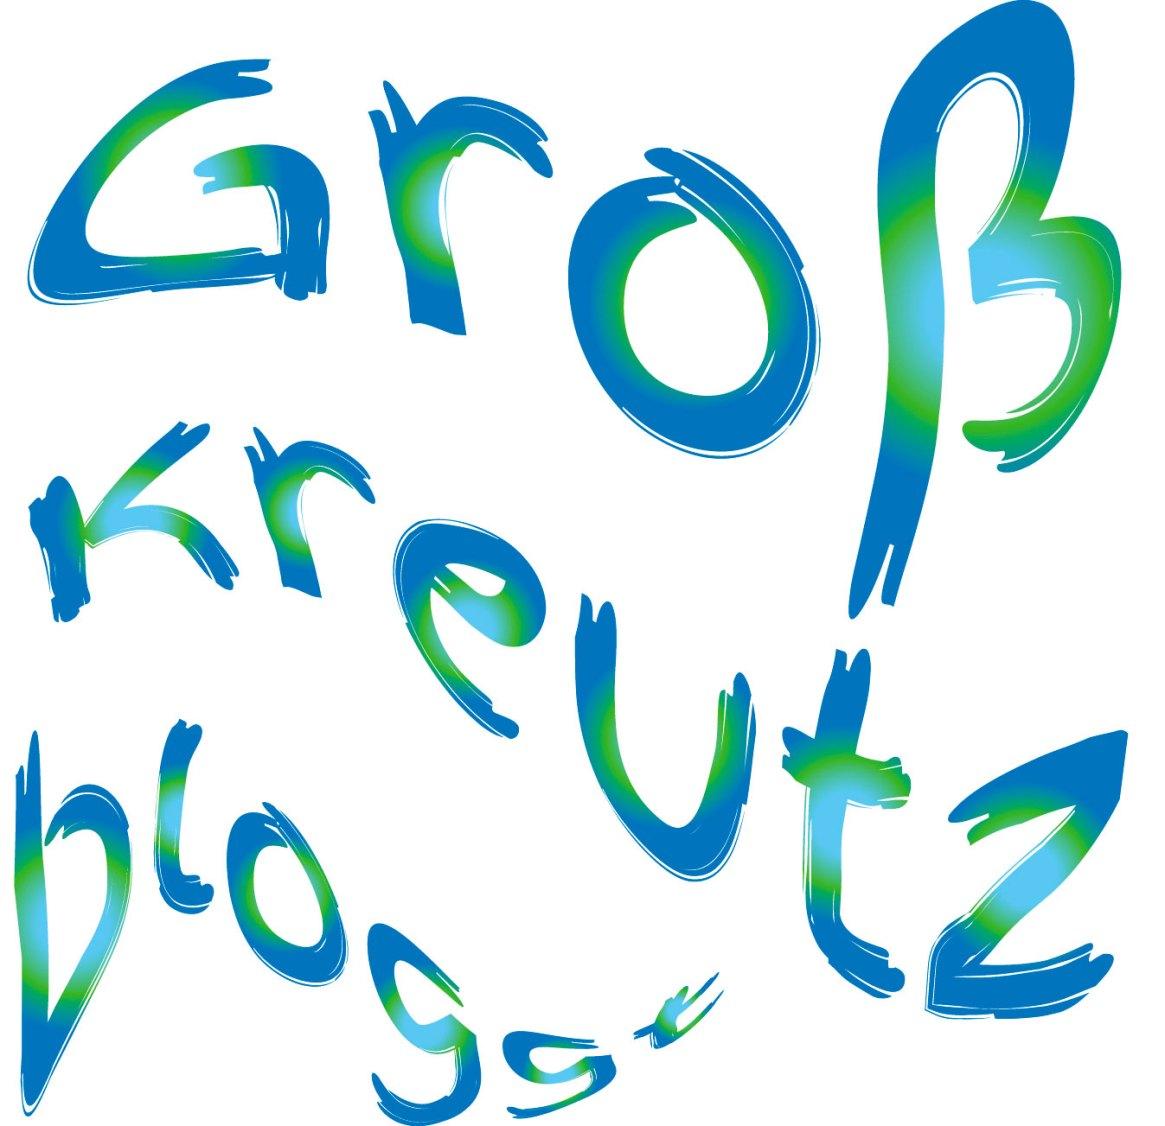 Gross-Kreutz-quadrat-w